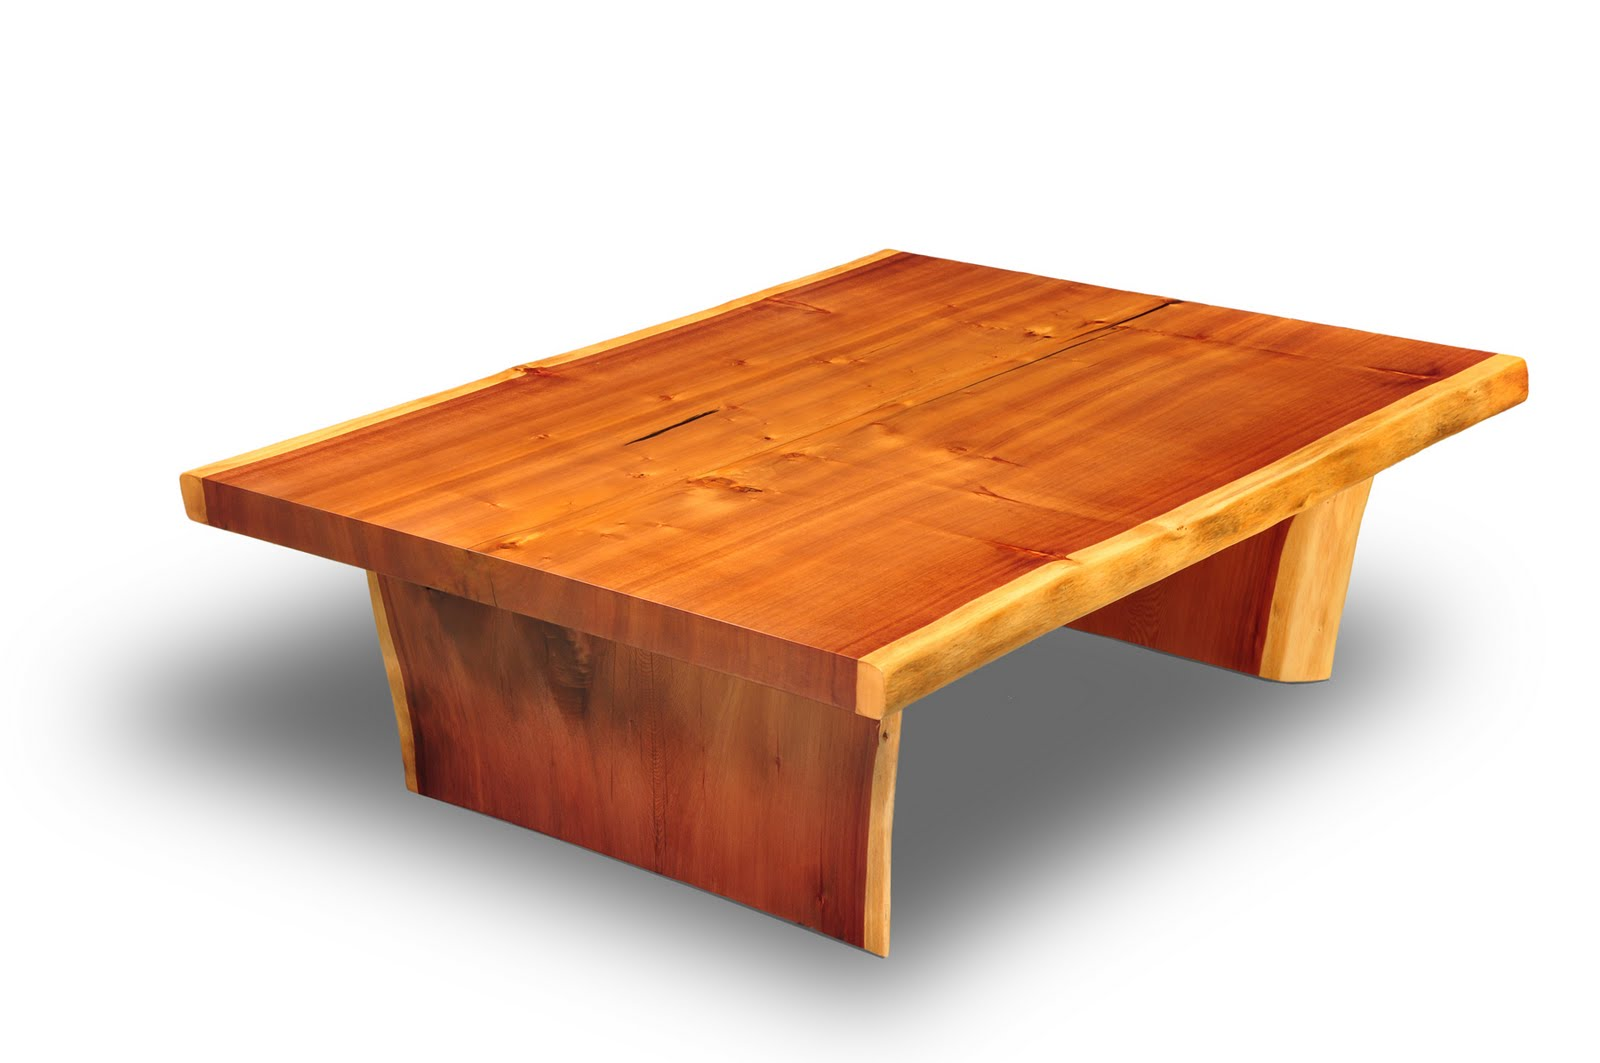 Charming CFA Large Coastal Redwood Slab Coffee Table 44inches Wide!